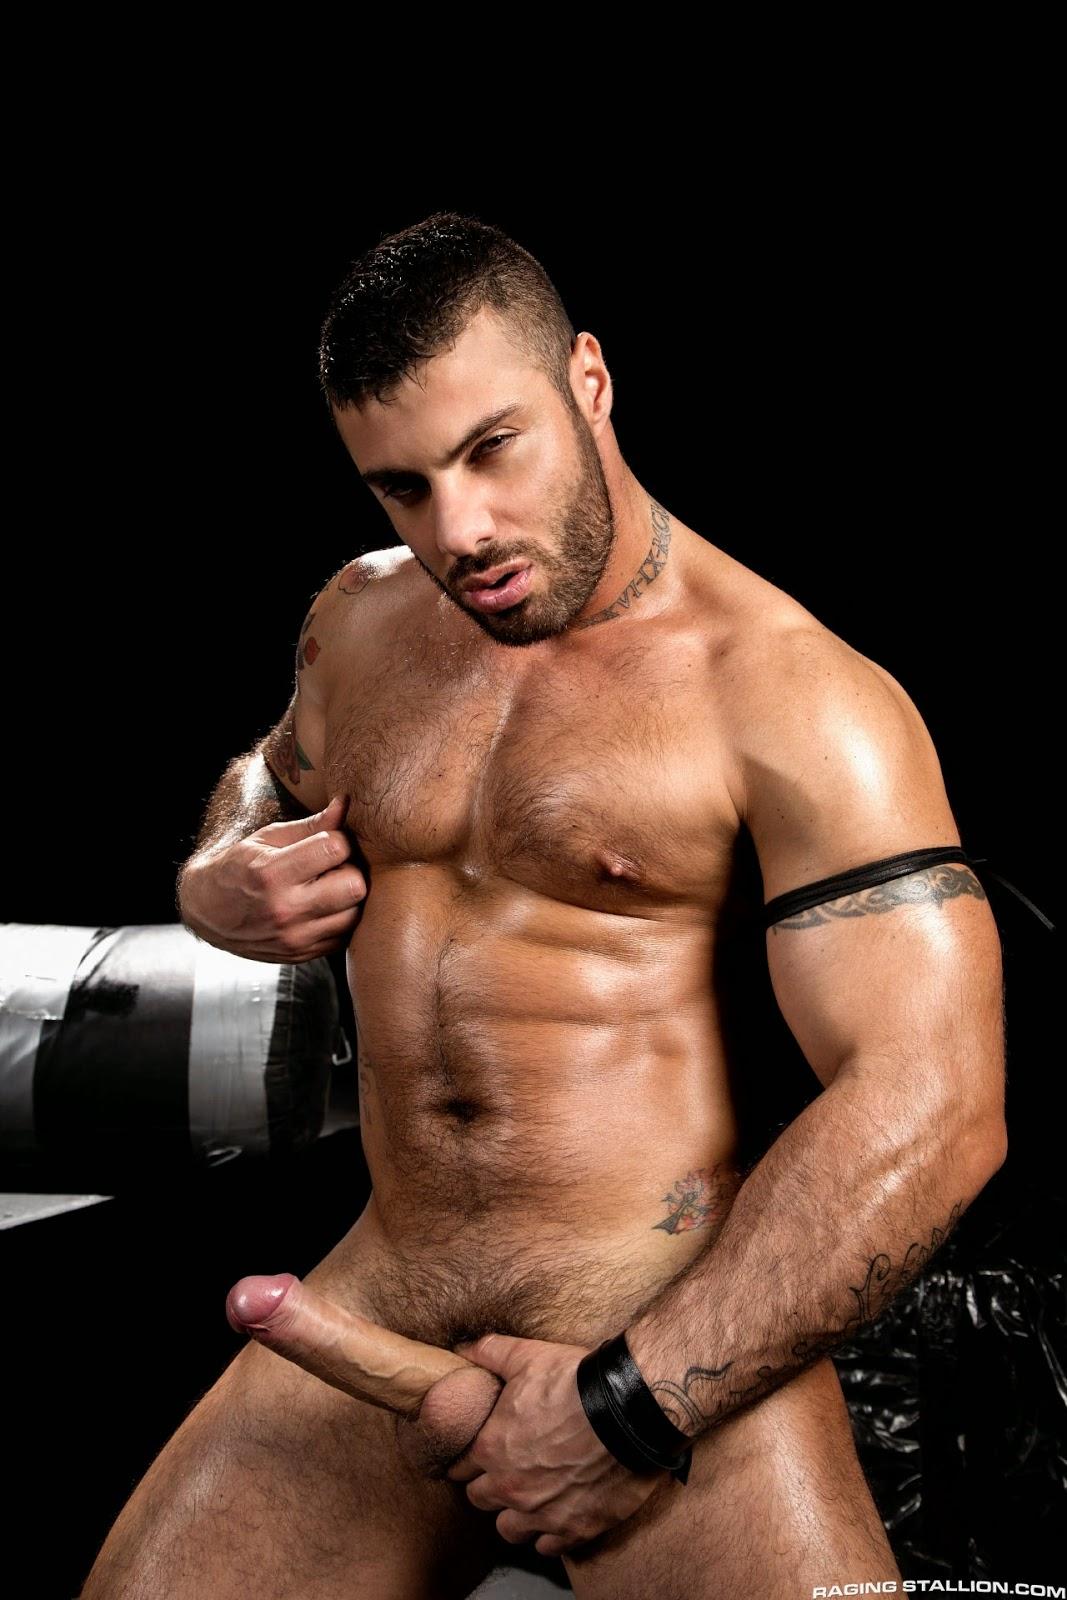 alex marte escort italia gay video